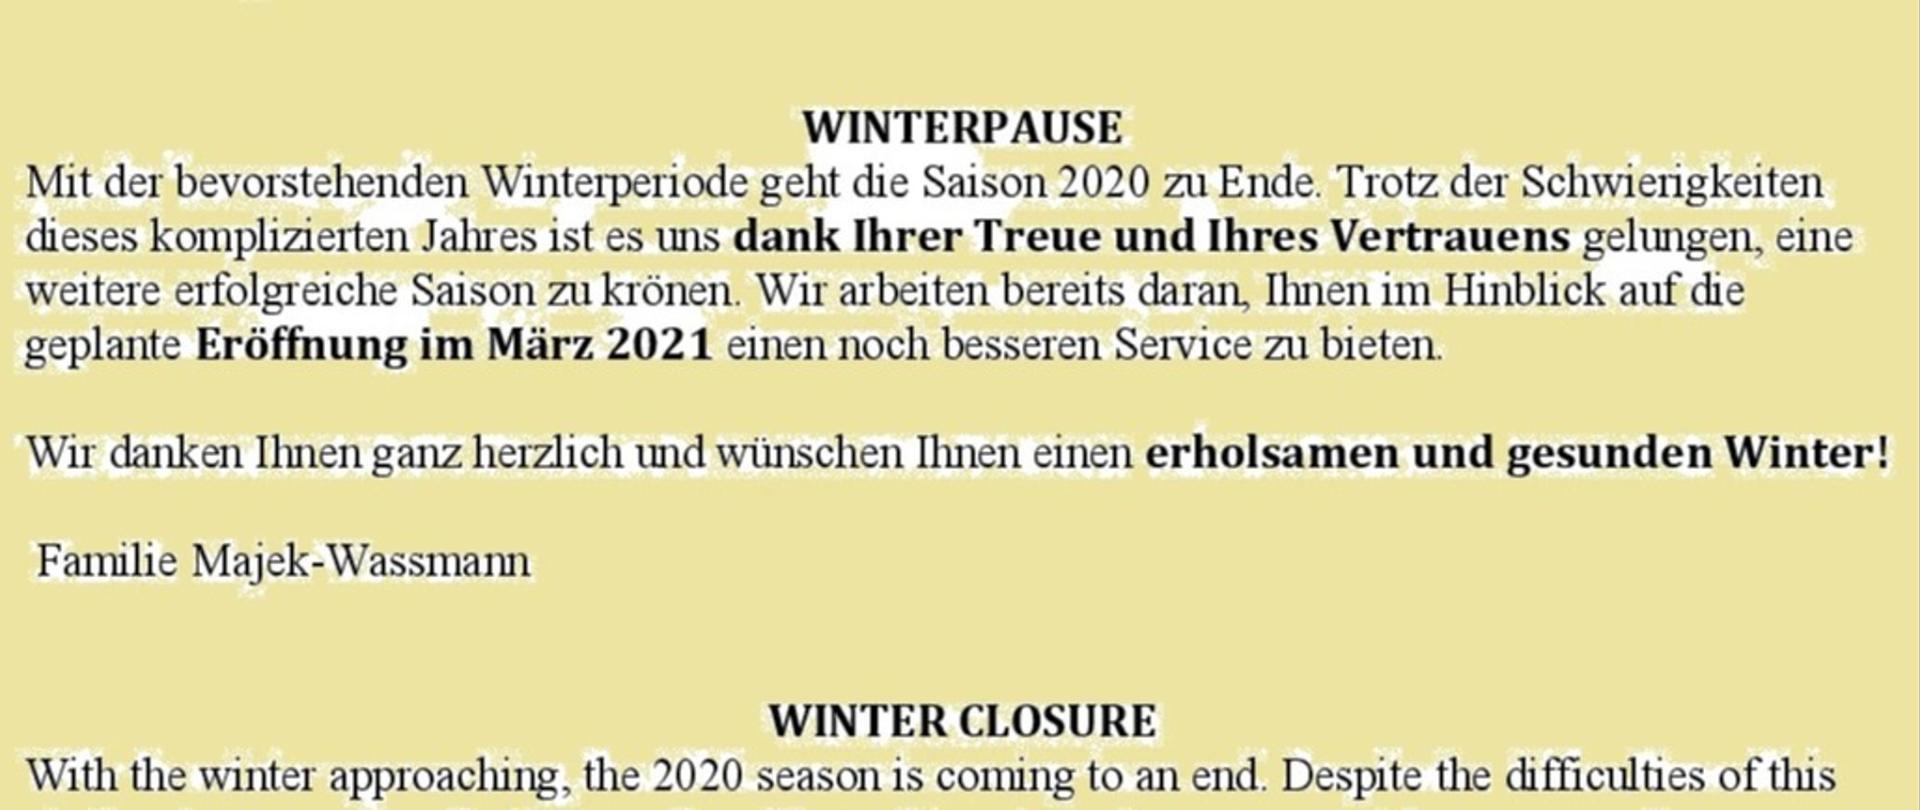 Chiusura invernale in 4 lingue foto.jpg